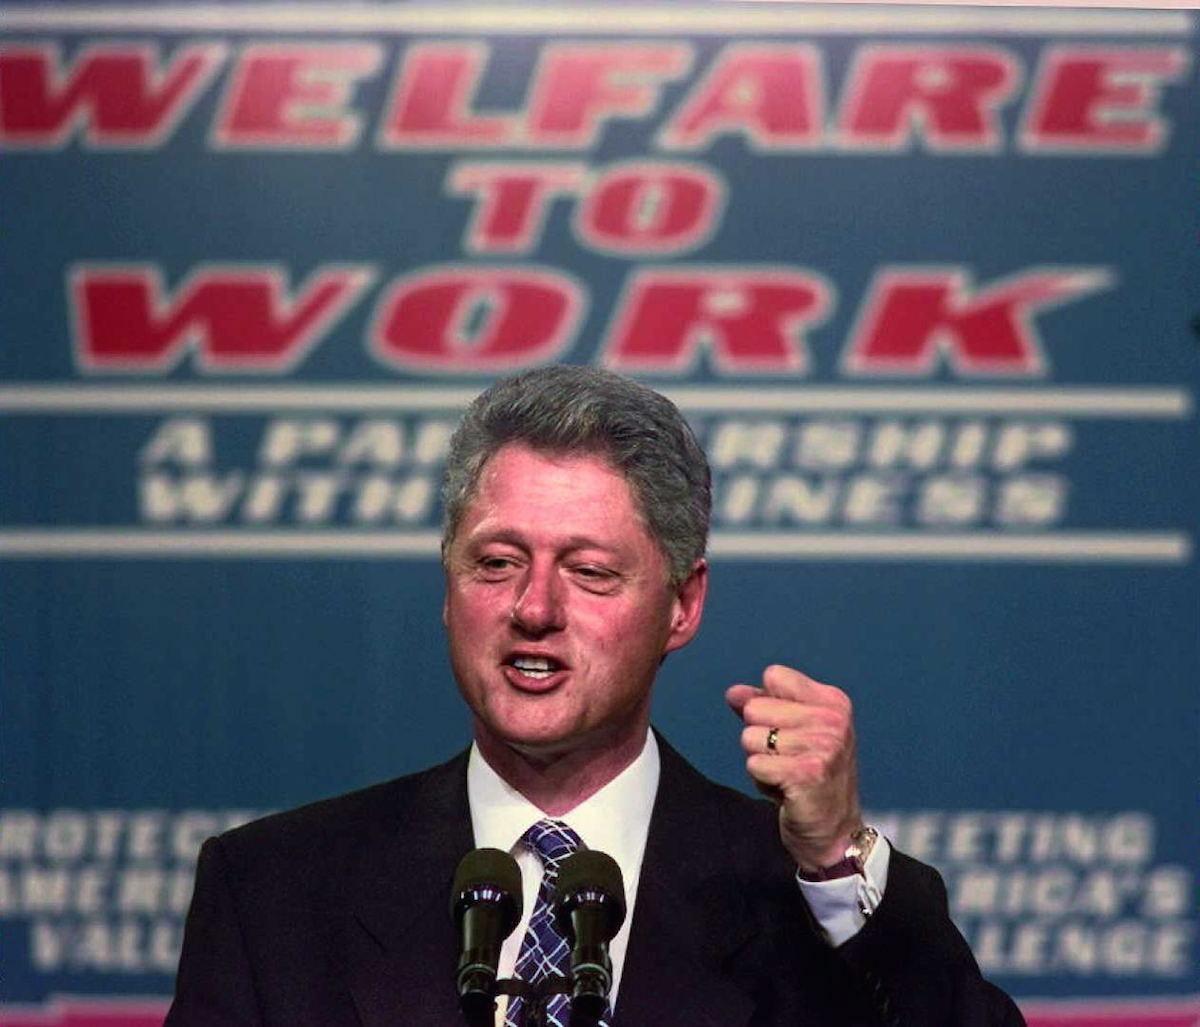 President Bill Clinton clinches his fist during an Oct. 27, 1996, speech on welfare reform at Vanderbilt University Medical Center in Nashville